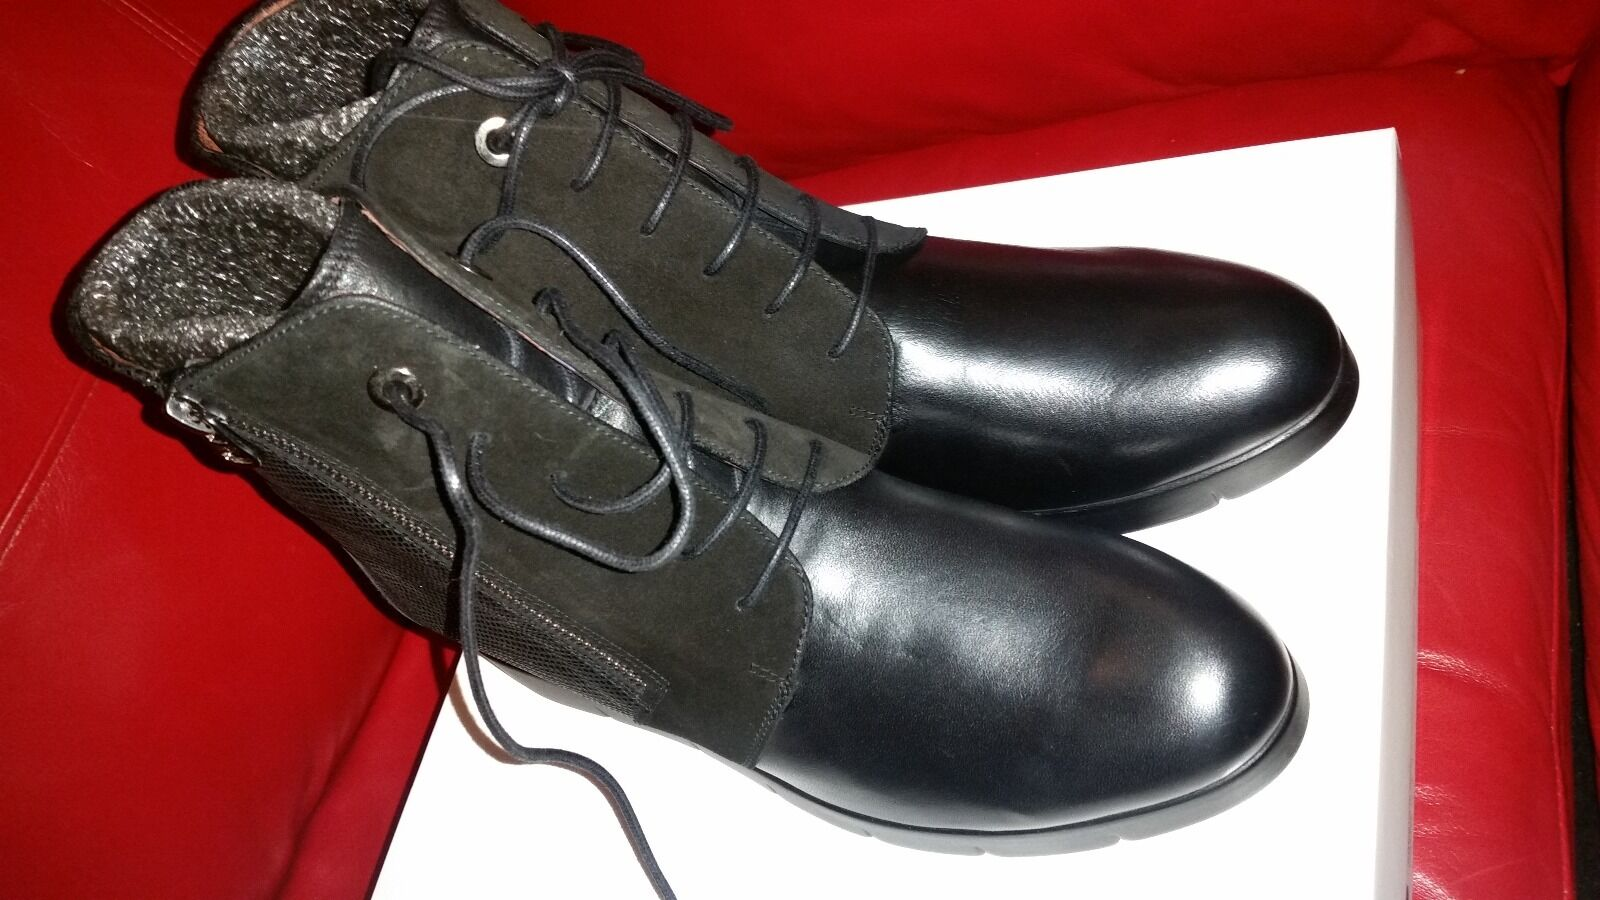 HISPANITAS LYDIA BLACK LEATHER BOOTIE BOOTS BOOTS BOOTS NIB EU 41 10 10.5 0a3ff4